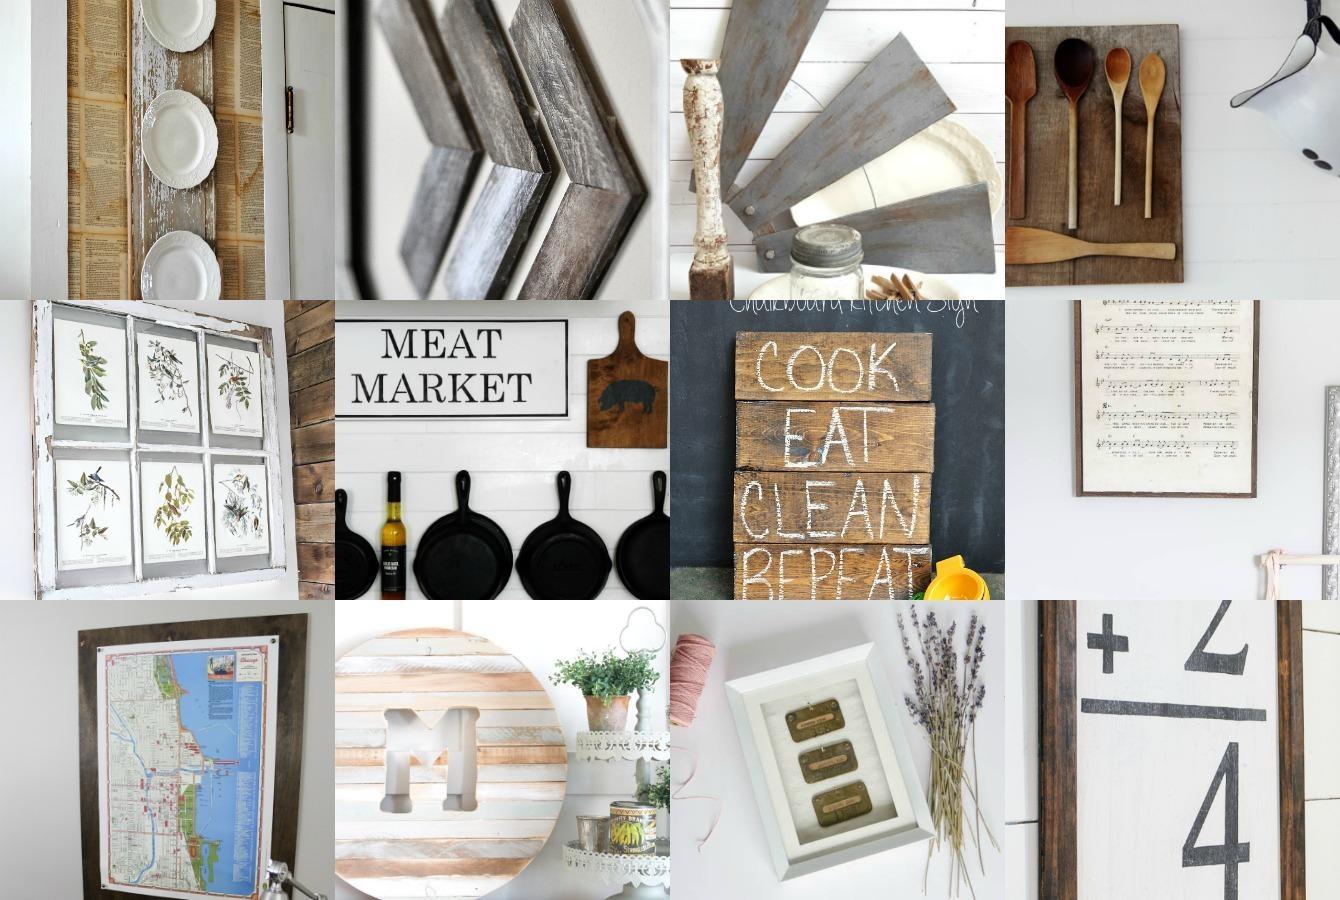 Diy Farmhouse Wall Decor Inspiration – The Crazy Craft Lady Within Farmhouse Wall Art (Image 10 of 20)